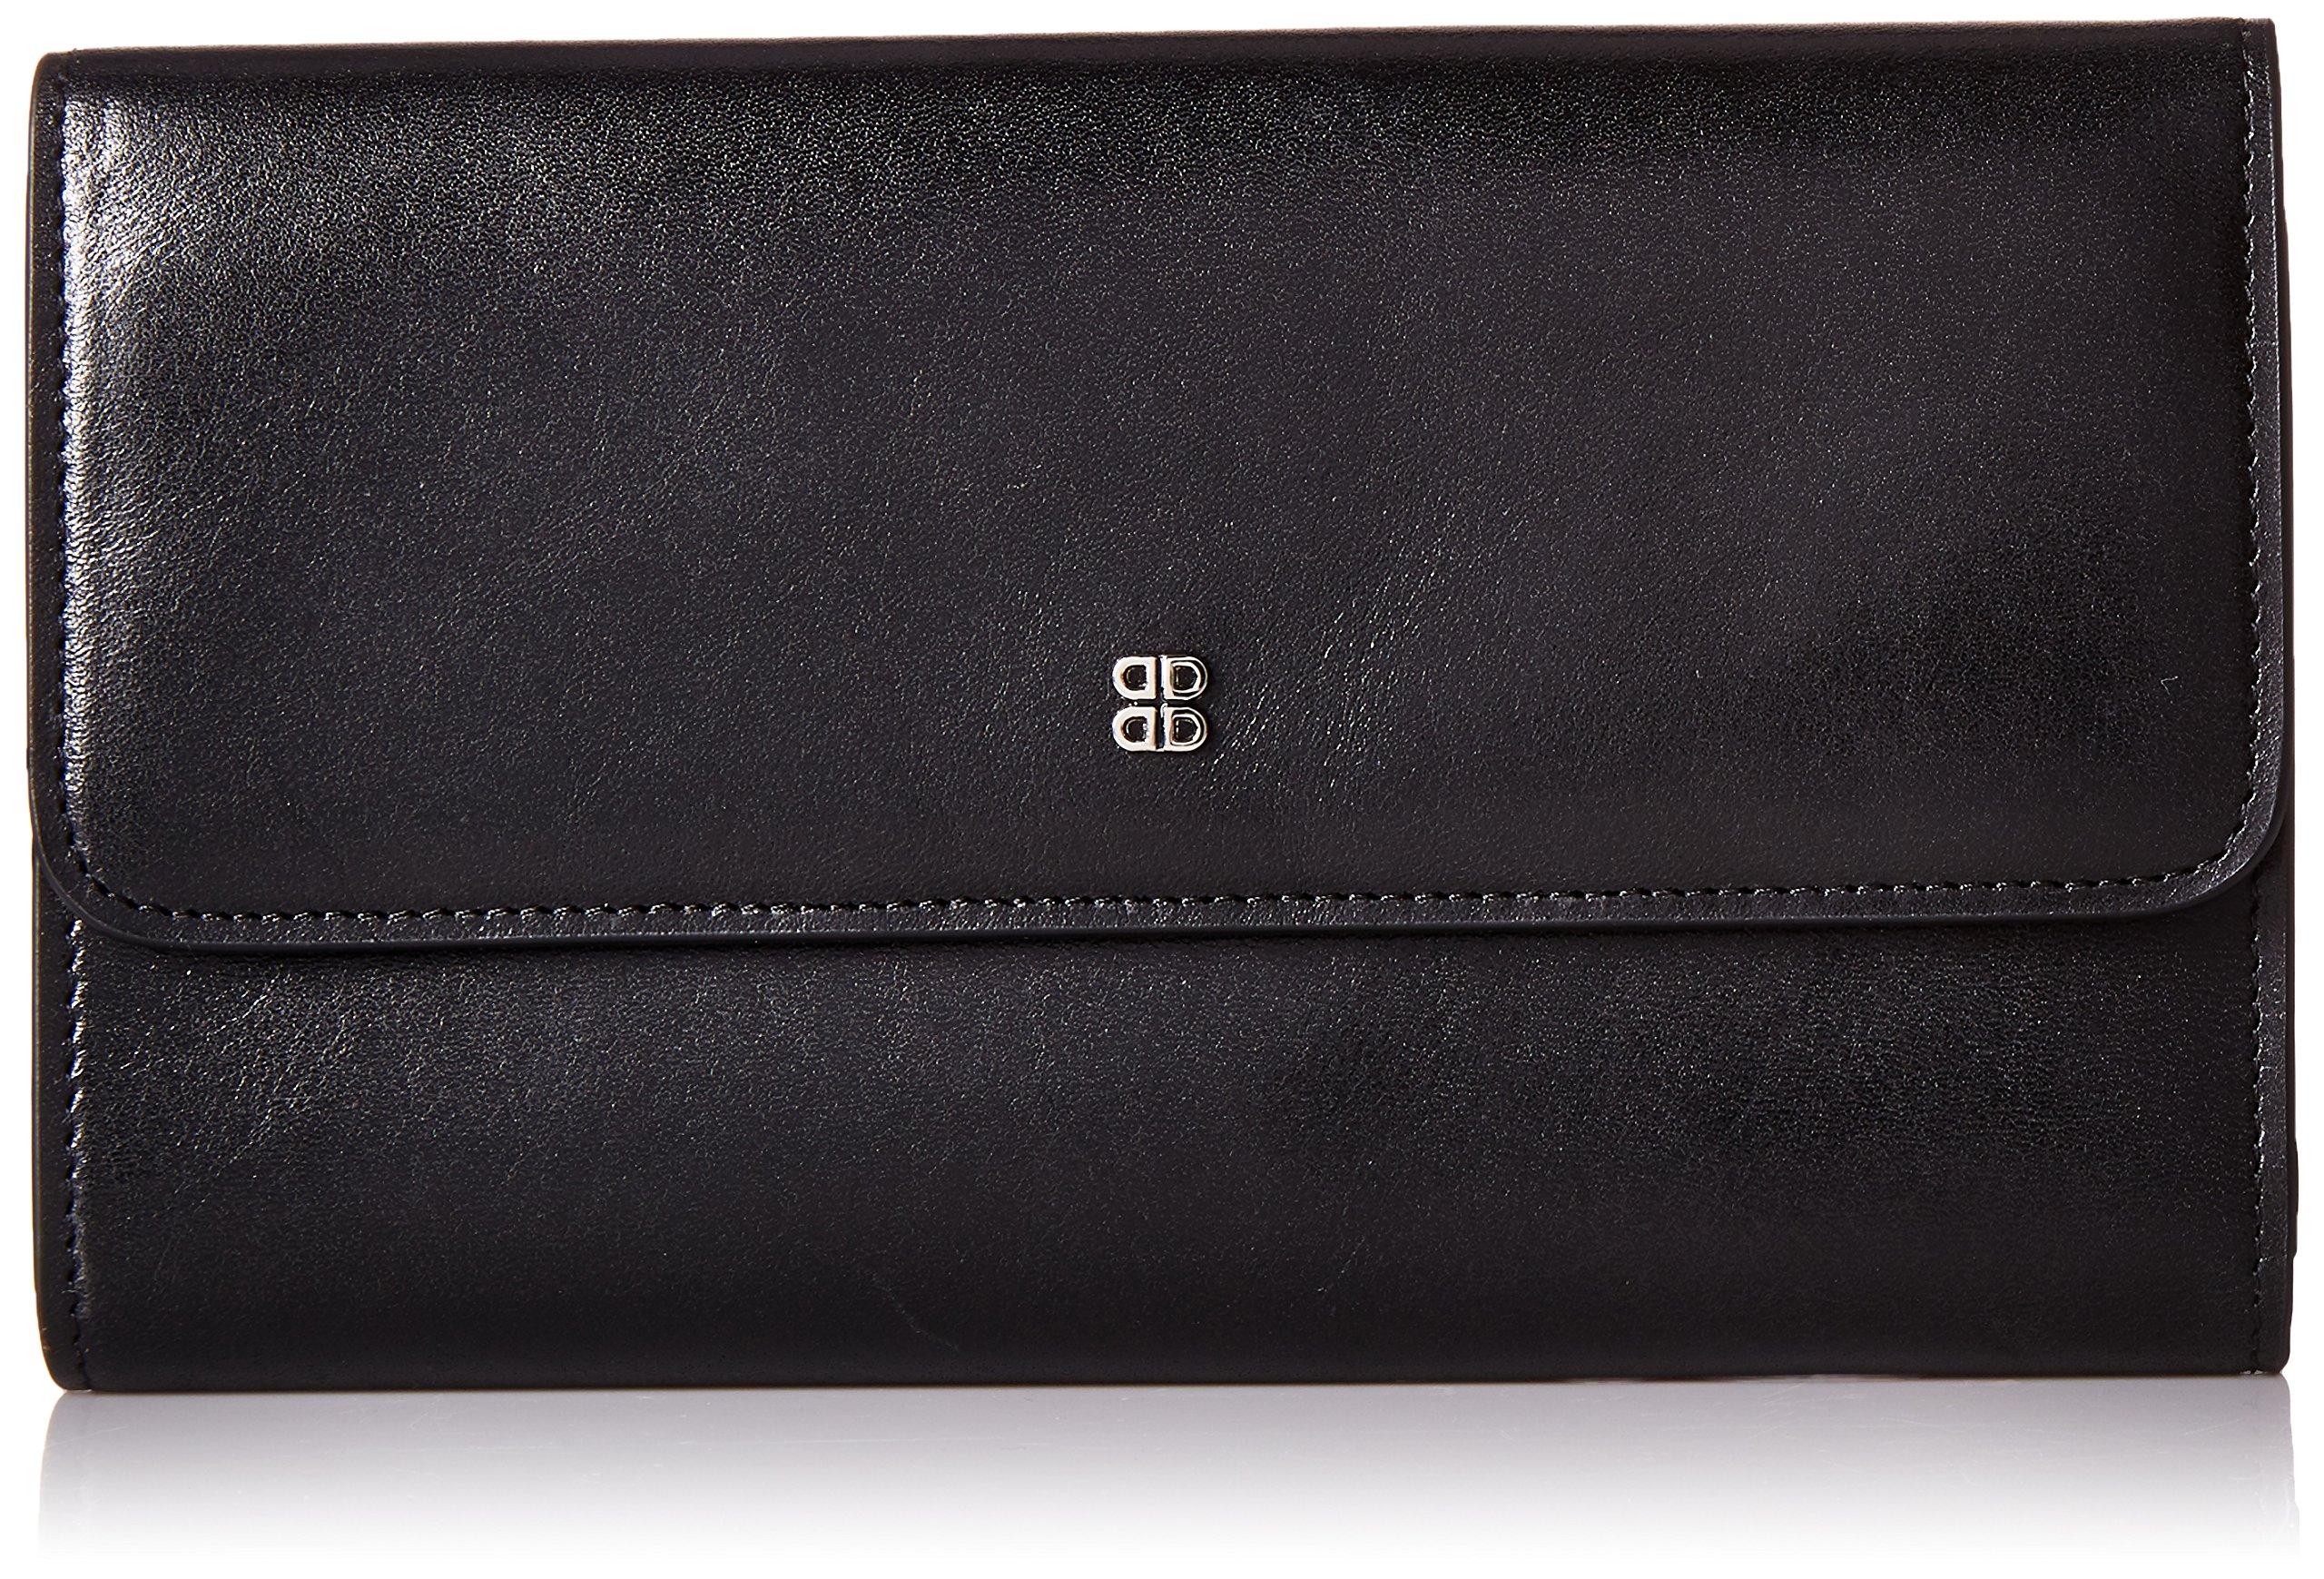 Bosca Women's Old Leather Checkbook Clutch Black One Size